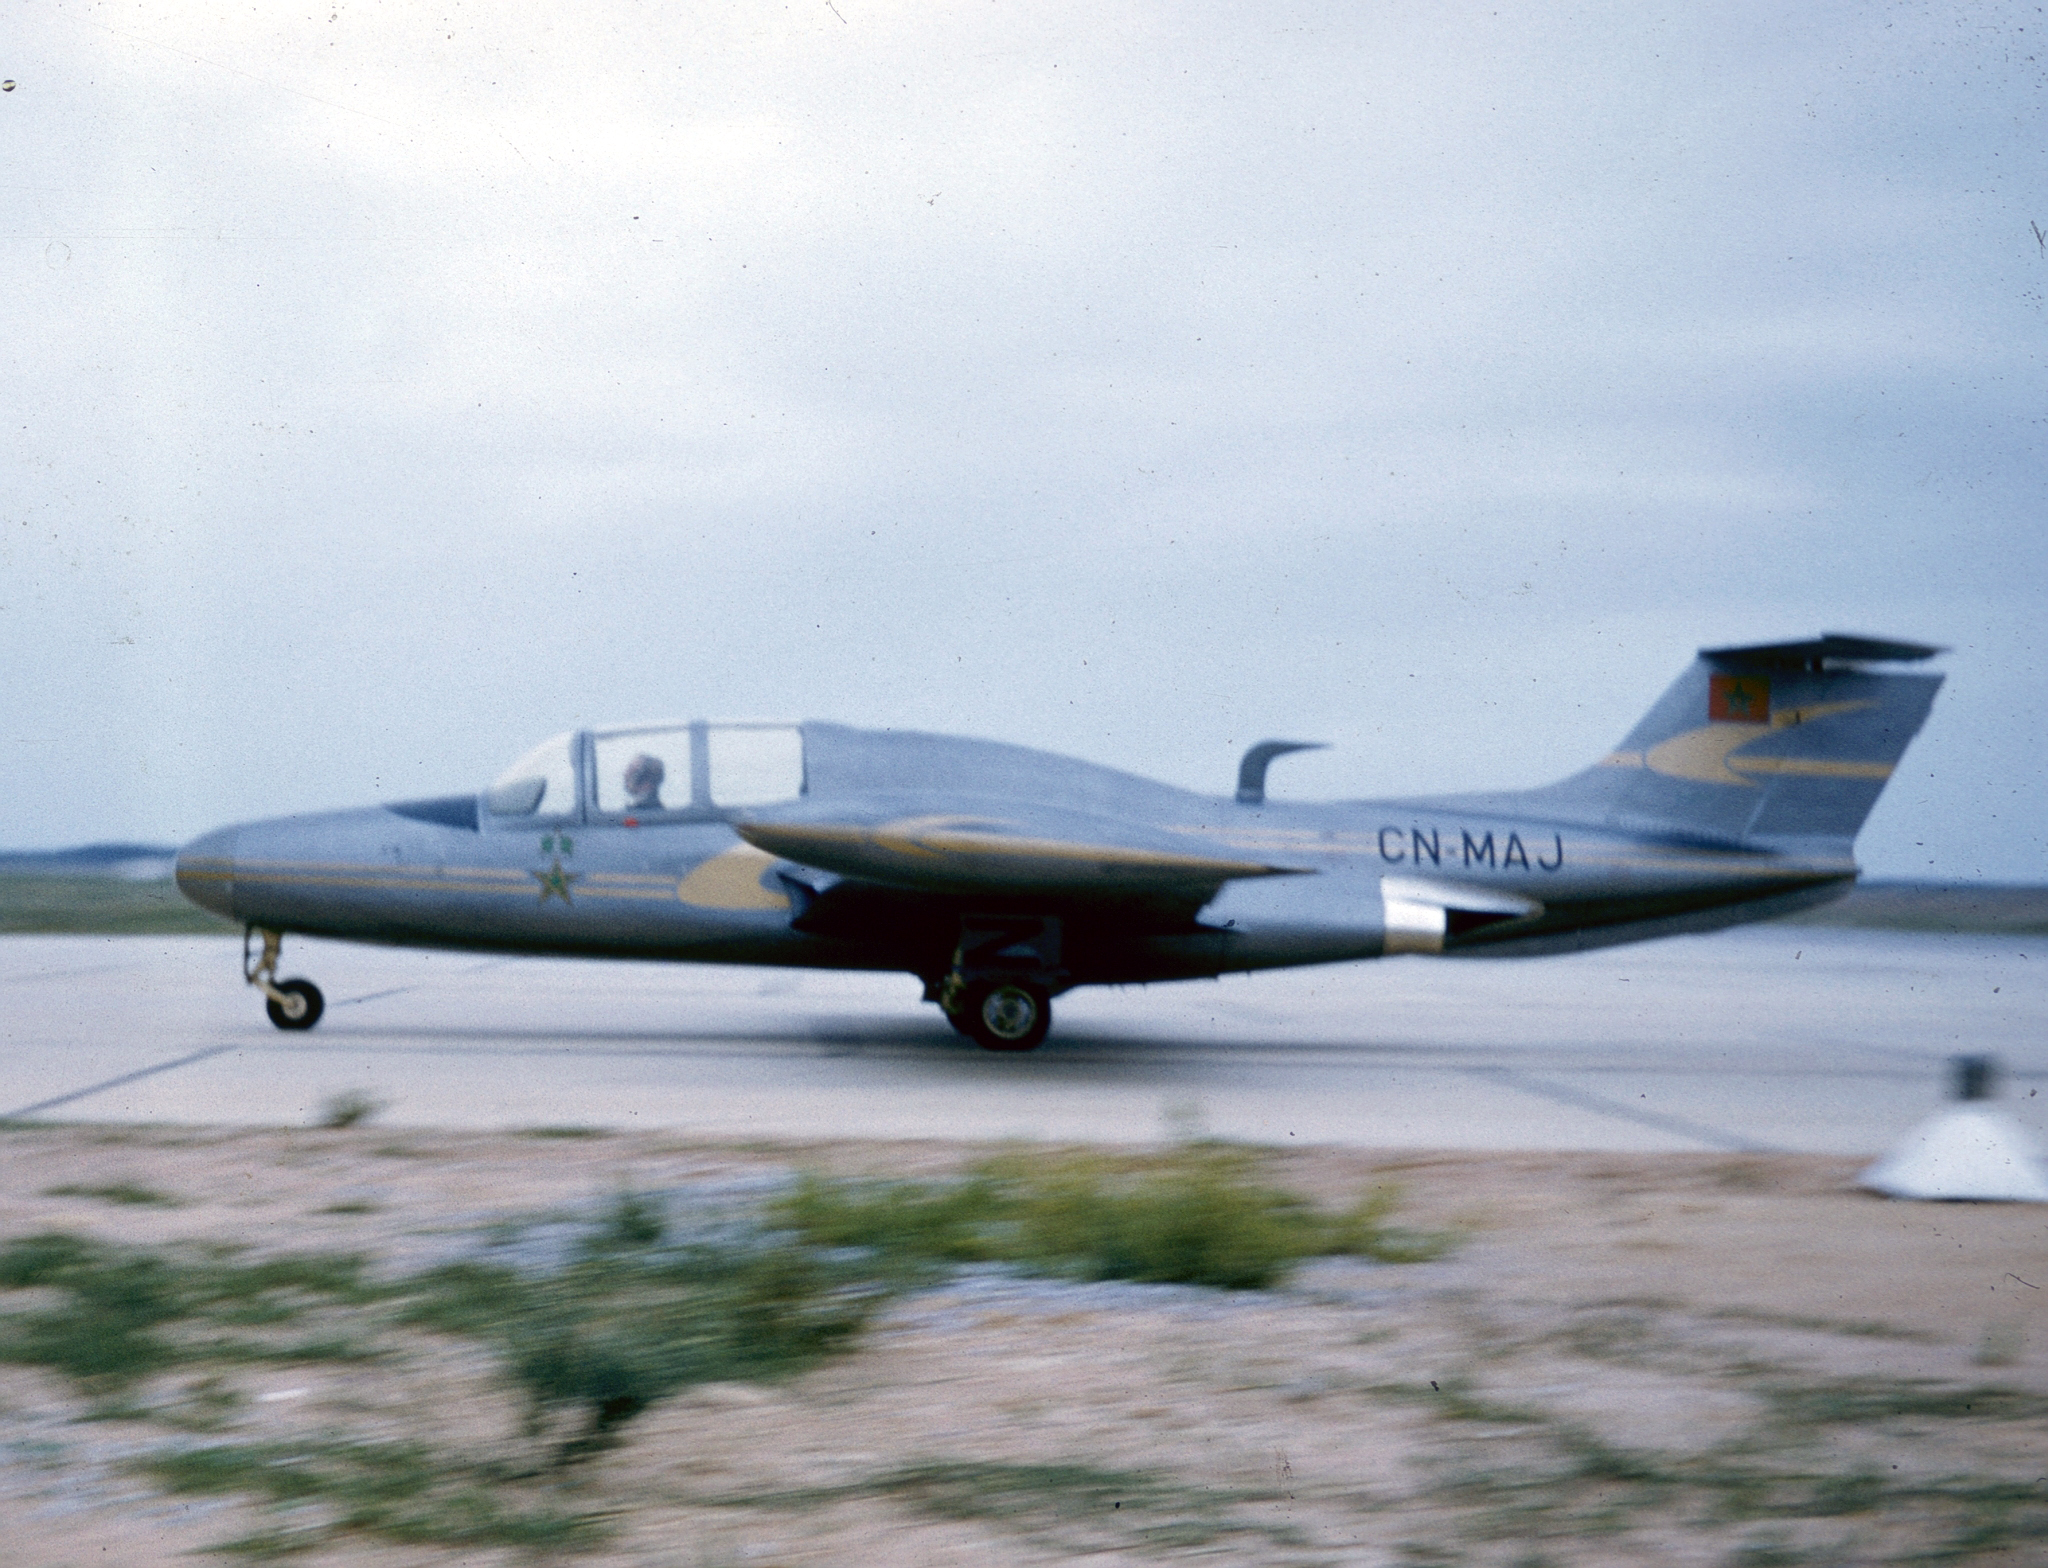 FRA: Photos anciens avions des FRA - Page 7 151229032113391409